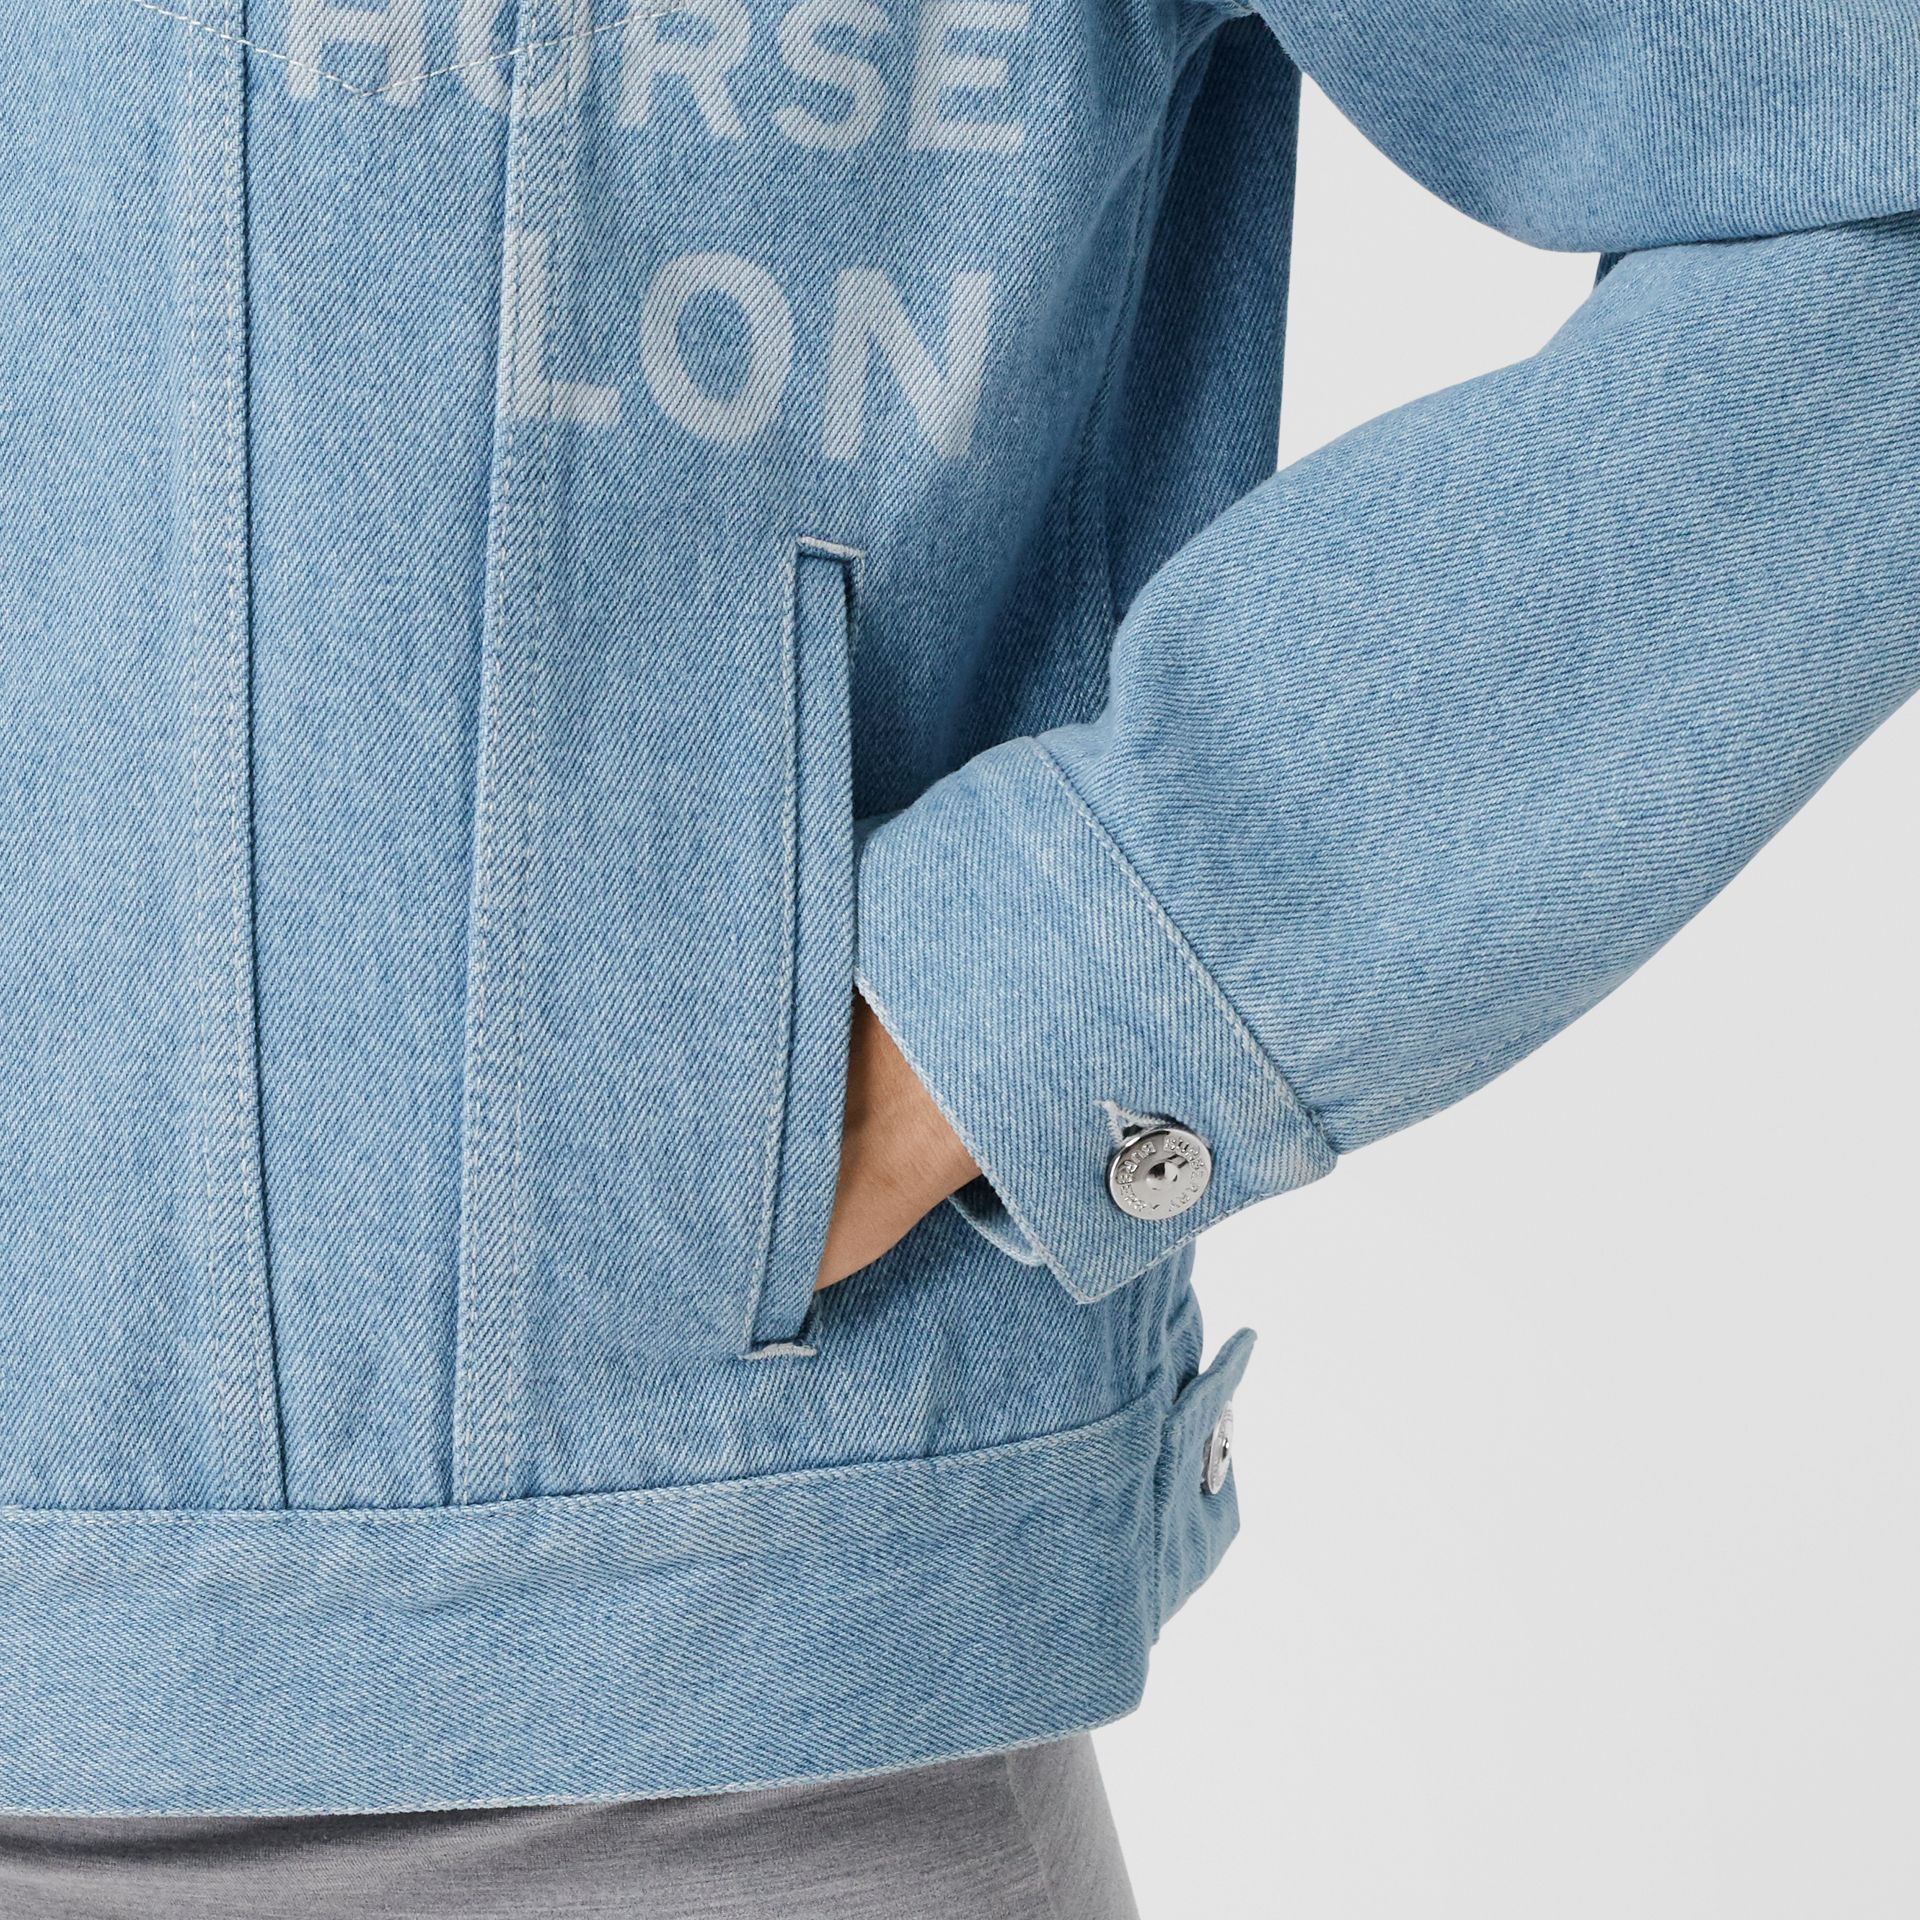 Horseferry Print Bleached Denim Jacket in Light Indigo - Women | Burberry Singapore - gallery image 4